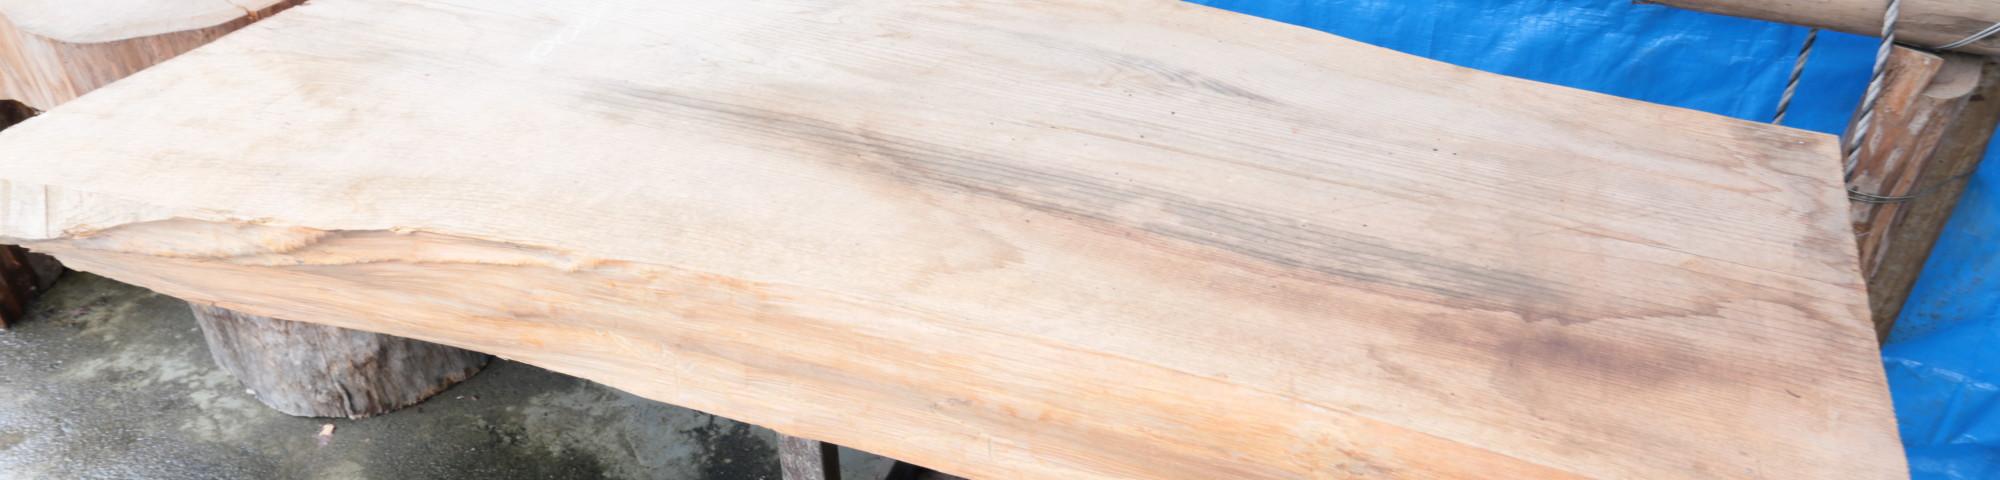 DIY木材、自然素材オーダー家具 古っ木屋